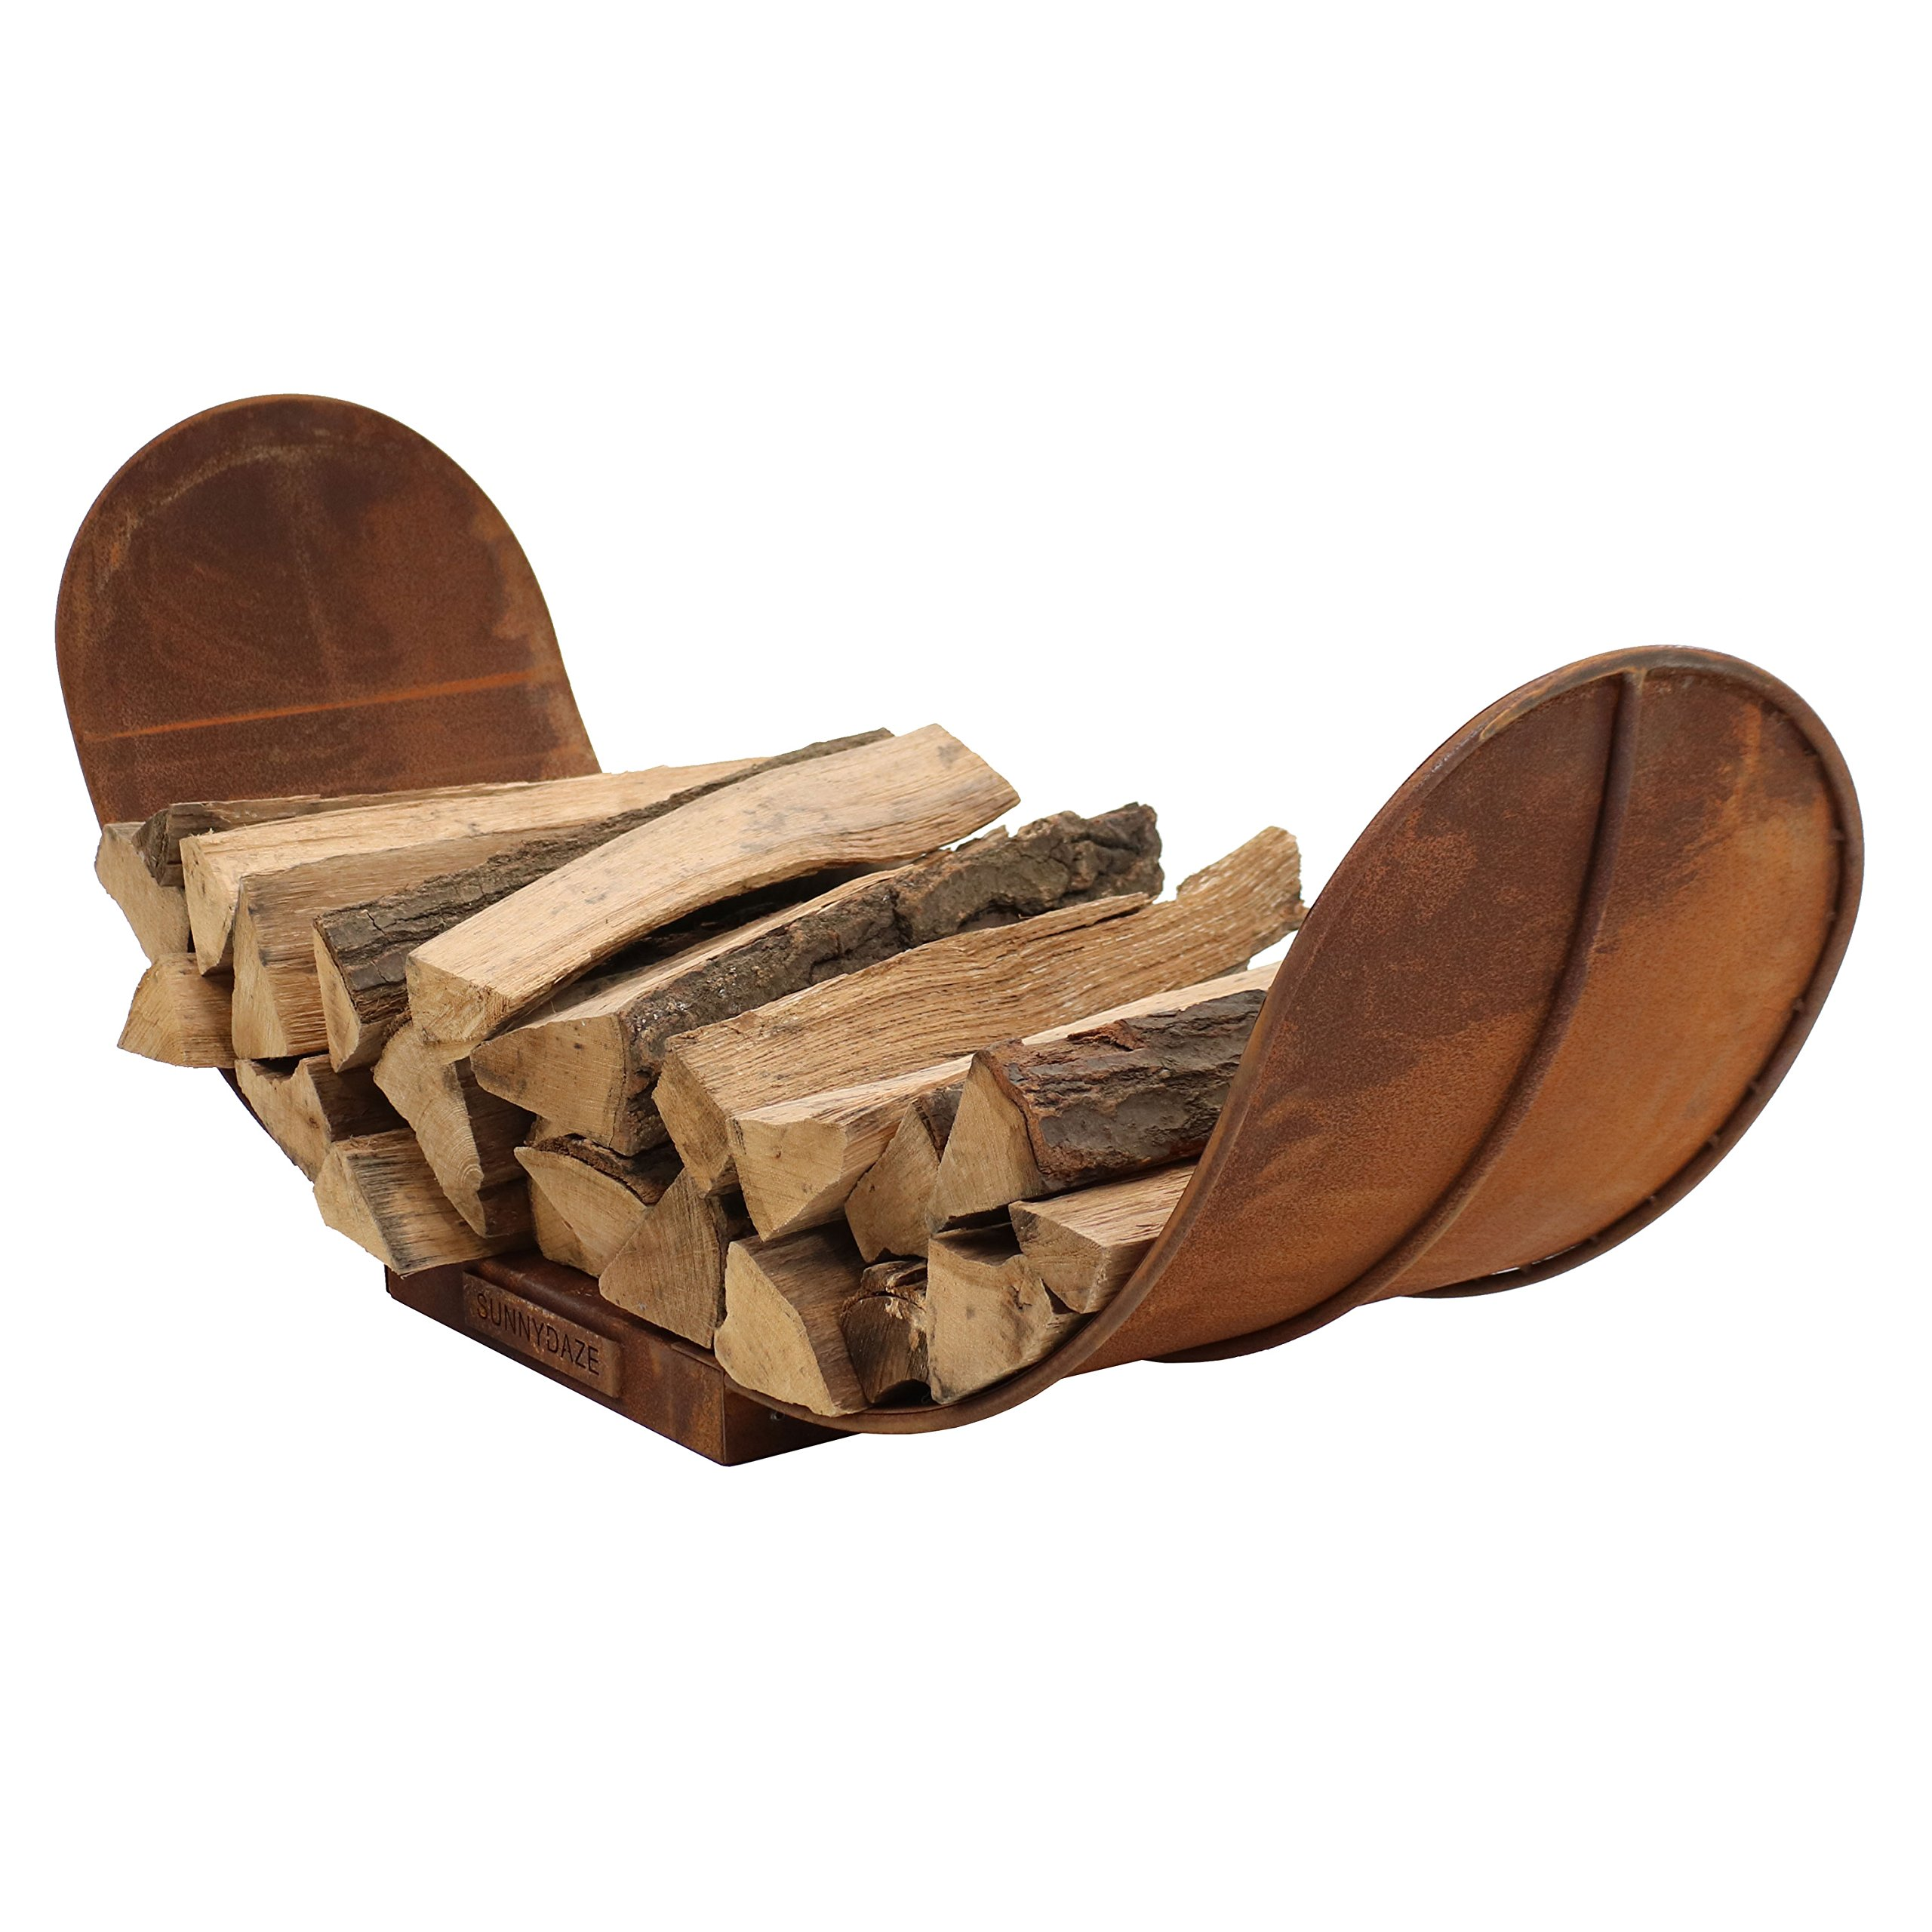 Sunnydaze 4-Foot Firewood Log Rack, Outdoor Fireplace Wood Storage Holder, Rustic Steel by Sunnydaze Decor